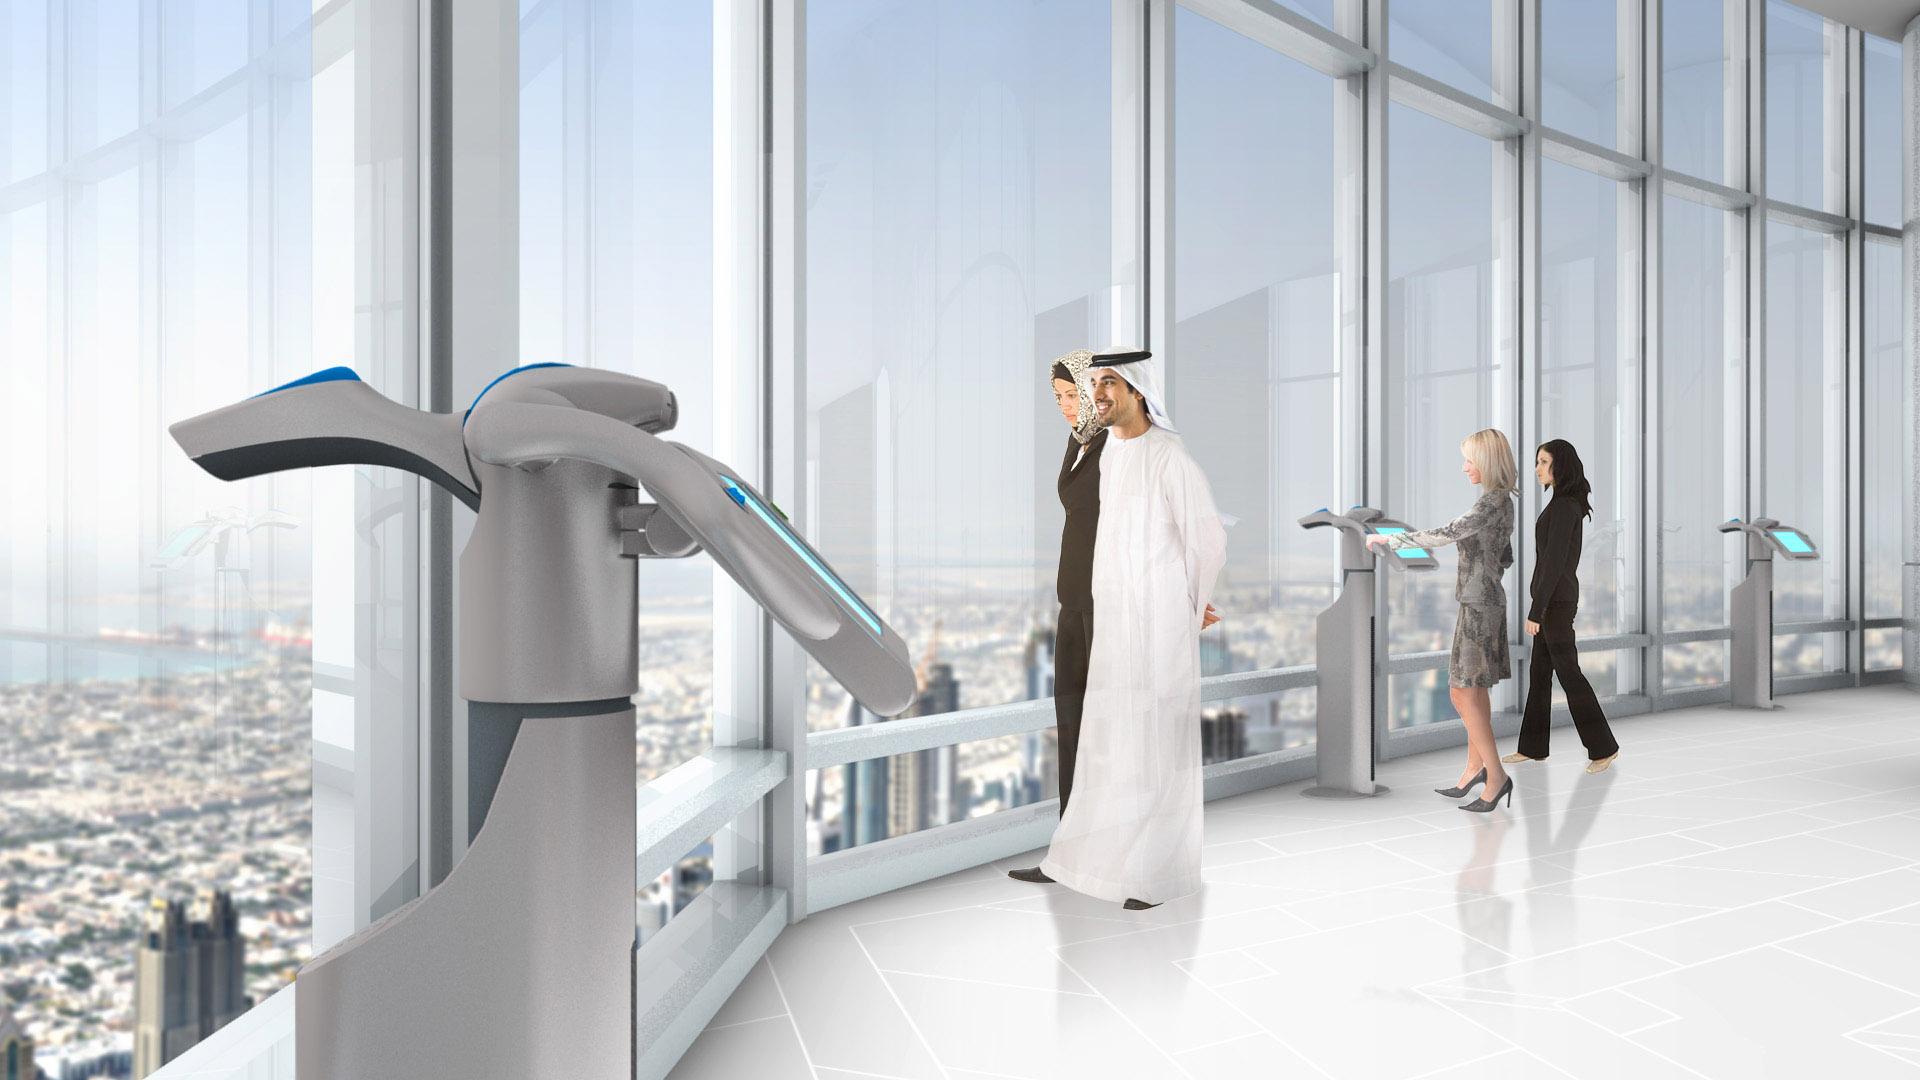 Dubai, United Arab Emirates, Burj Khalifa The Top Observation Deck